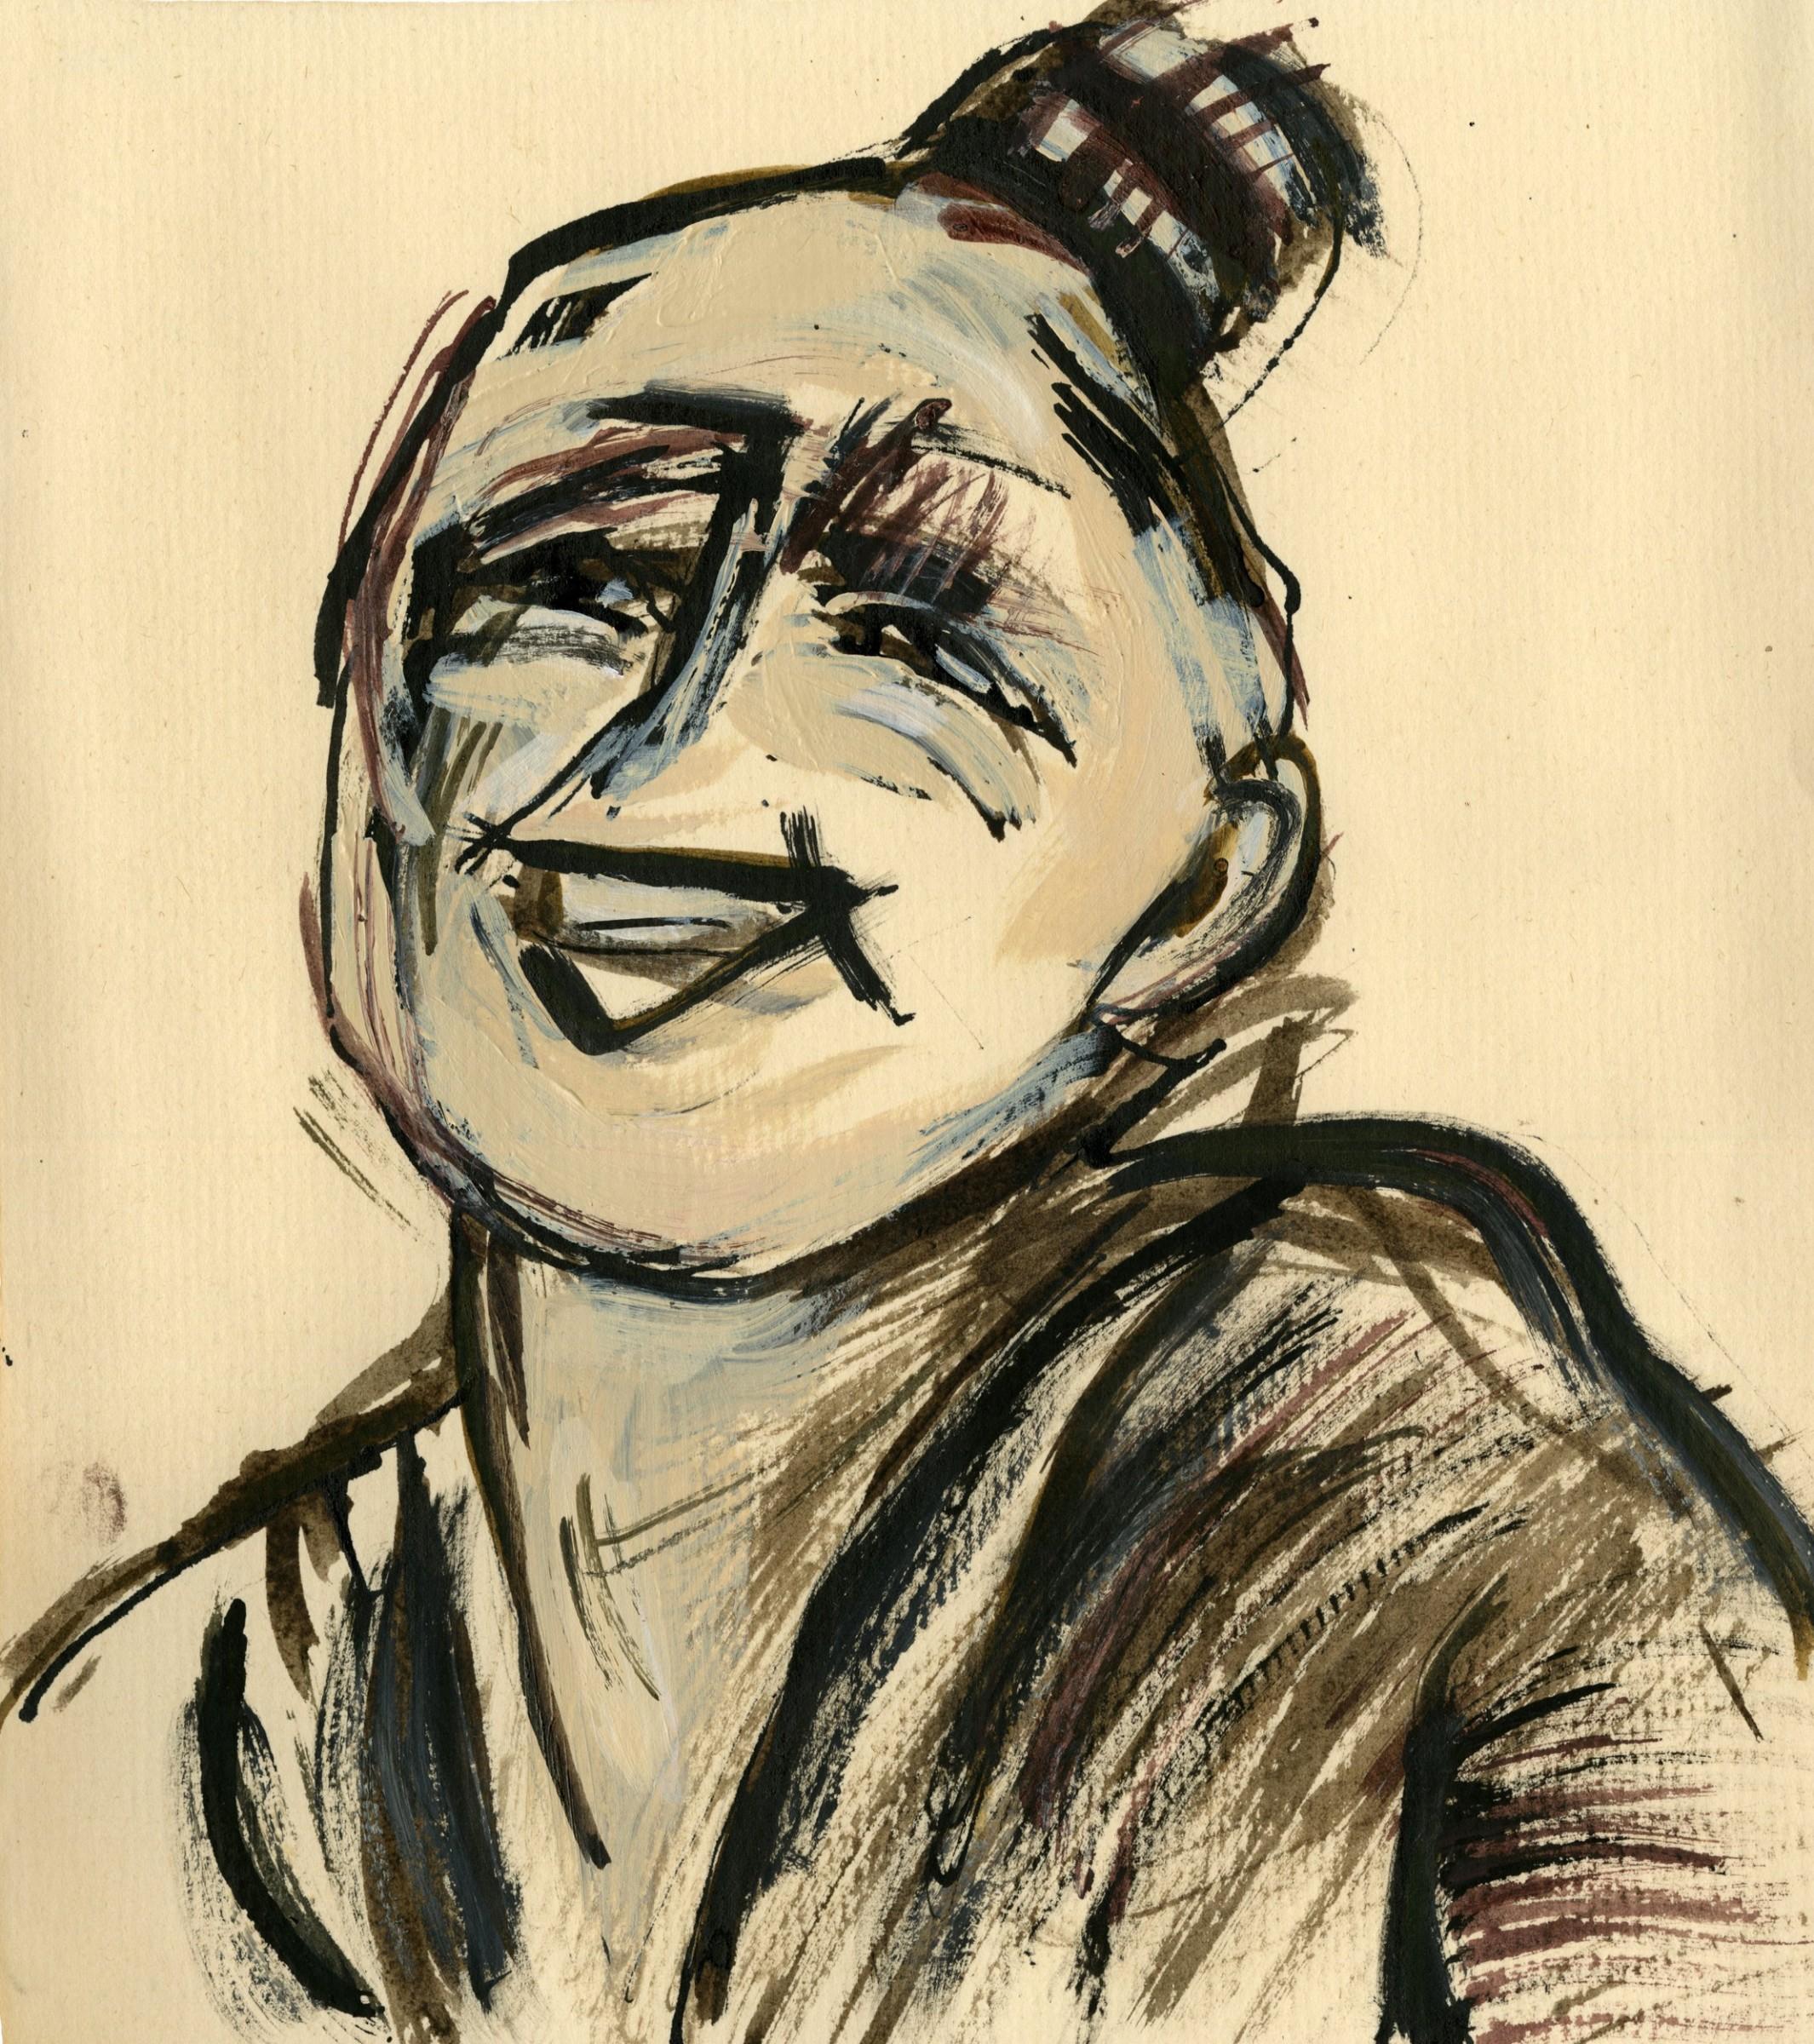 "<span class=""link fancybox-details-link""><a href=""/exhibitions/22/works/artworks_standalone11109/"">View Detail Page</a></span><div class=""artist""><span class=""artist""><strong>Julia Midgley RWS RE</strong></span></div><div class=""title""><em>Happy Campaigner</em></div><div class=""medium"">acrylic & ink</div><div class=""dimensions"">37 x 35 cm framed<br>25 x 22 cm image size</div>"